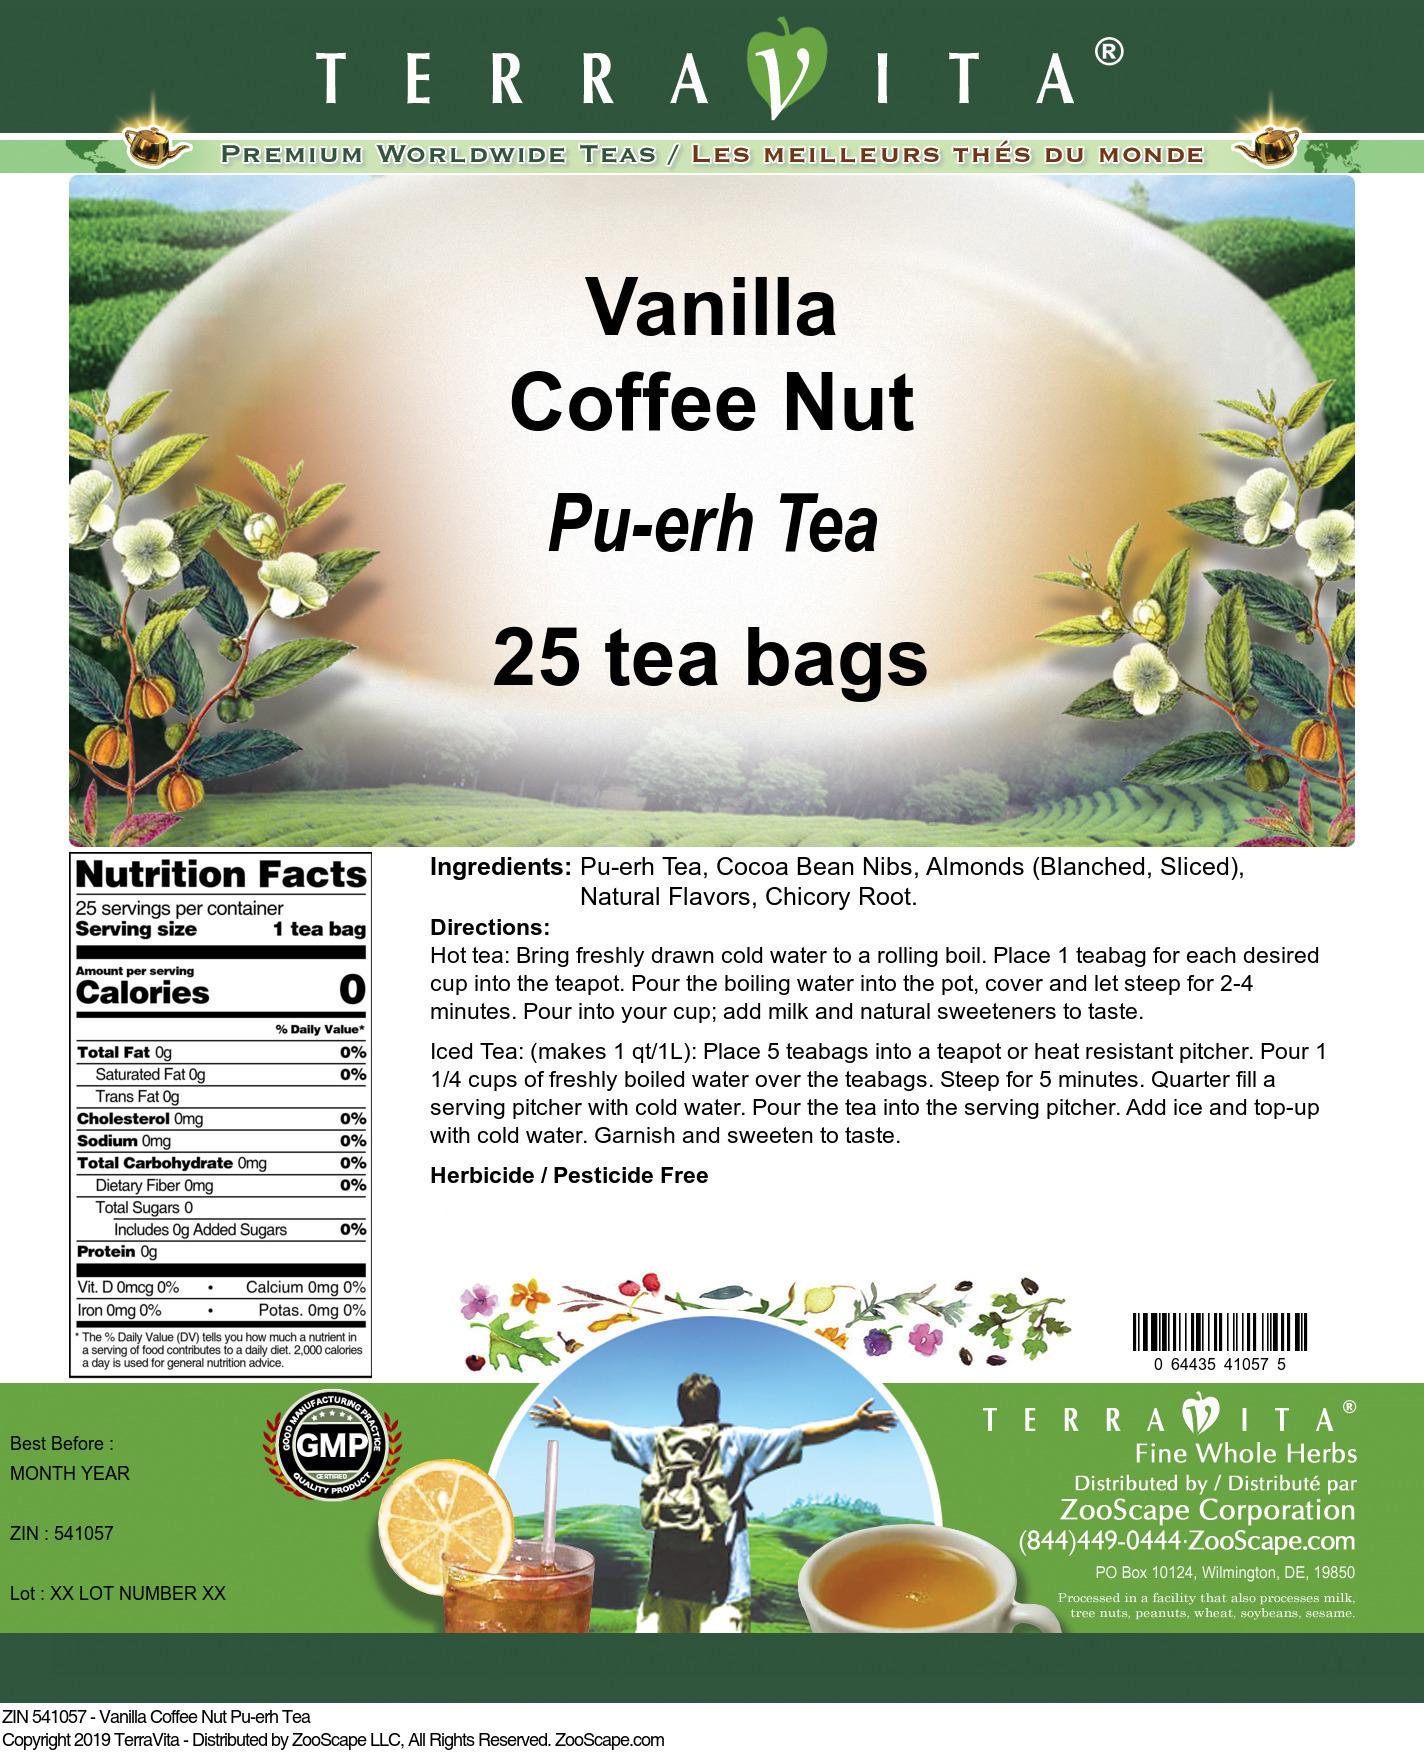 Vanilla Coffee Nut Pu-erh Tea